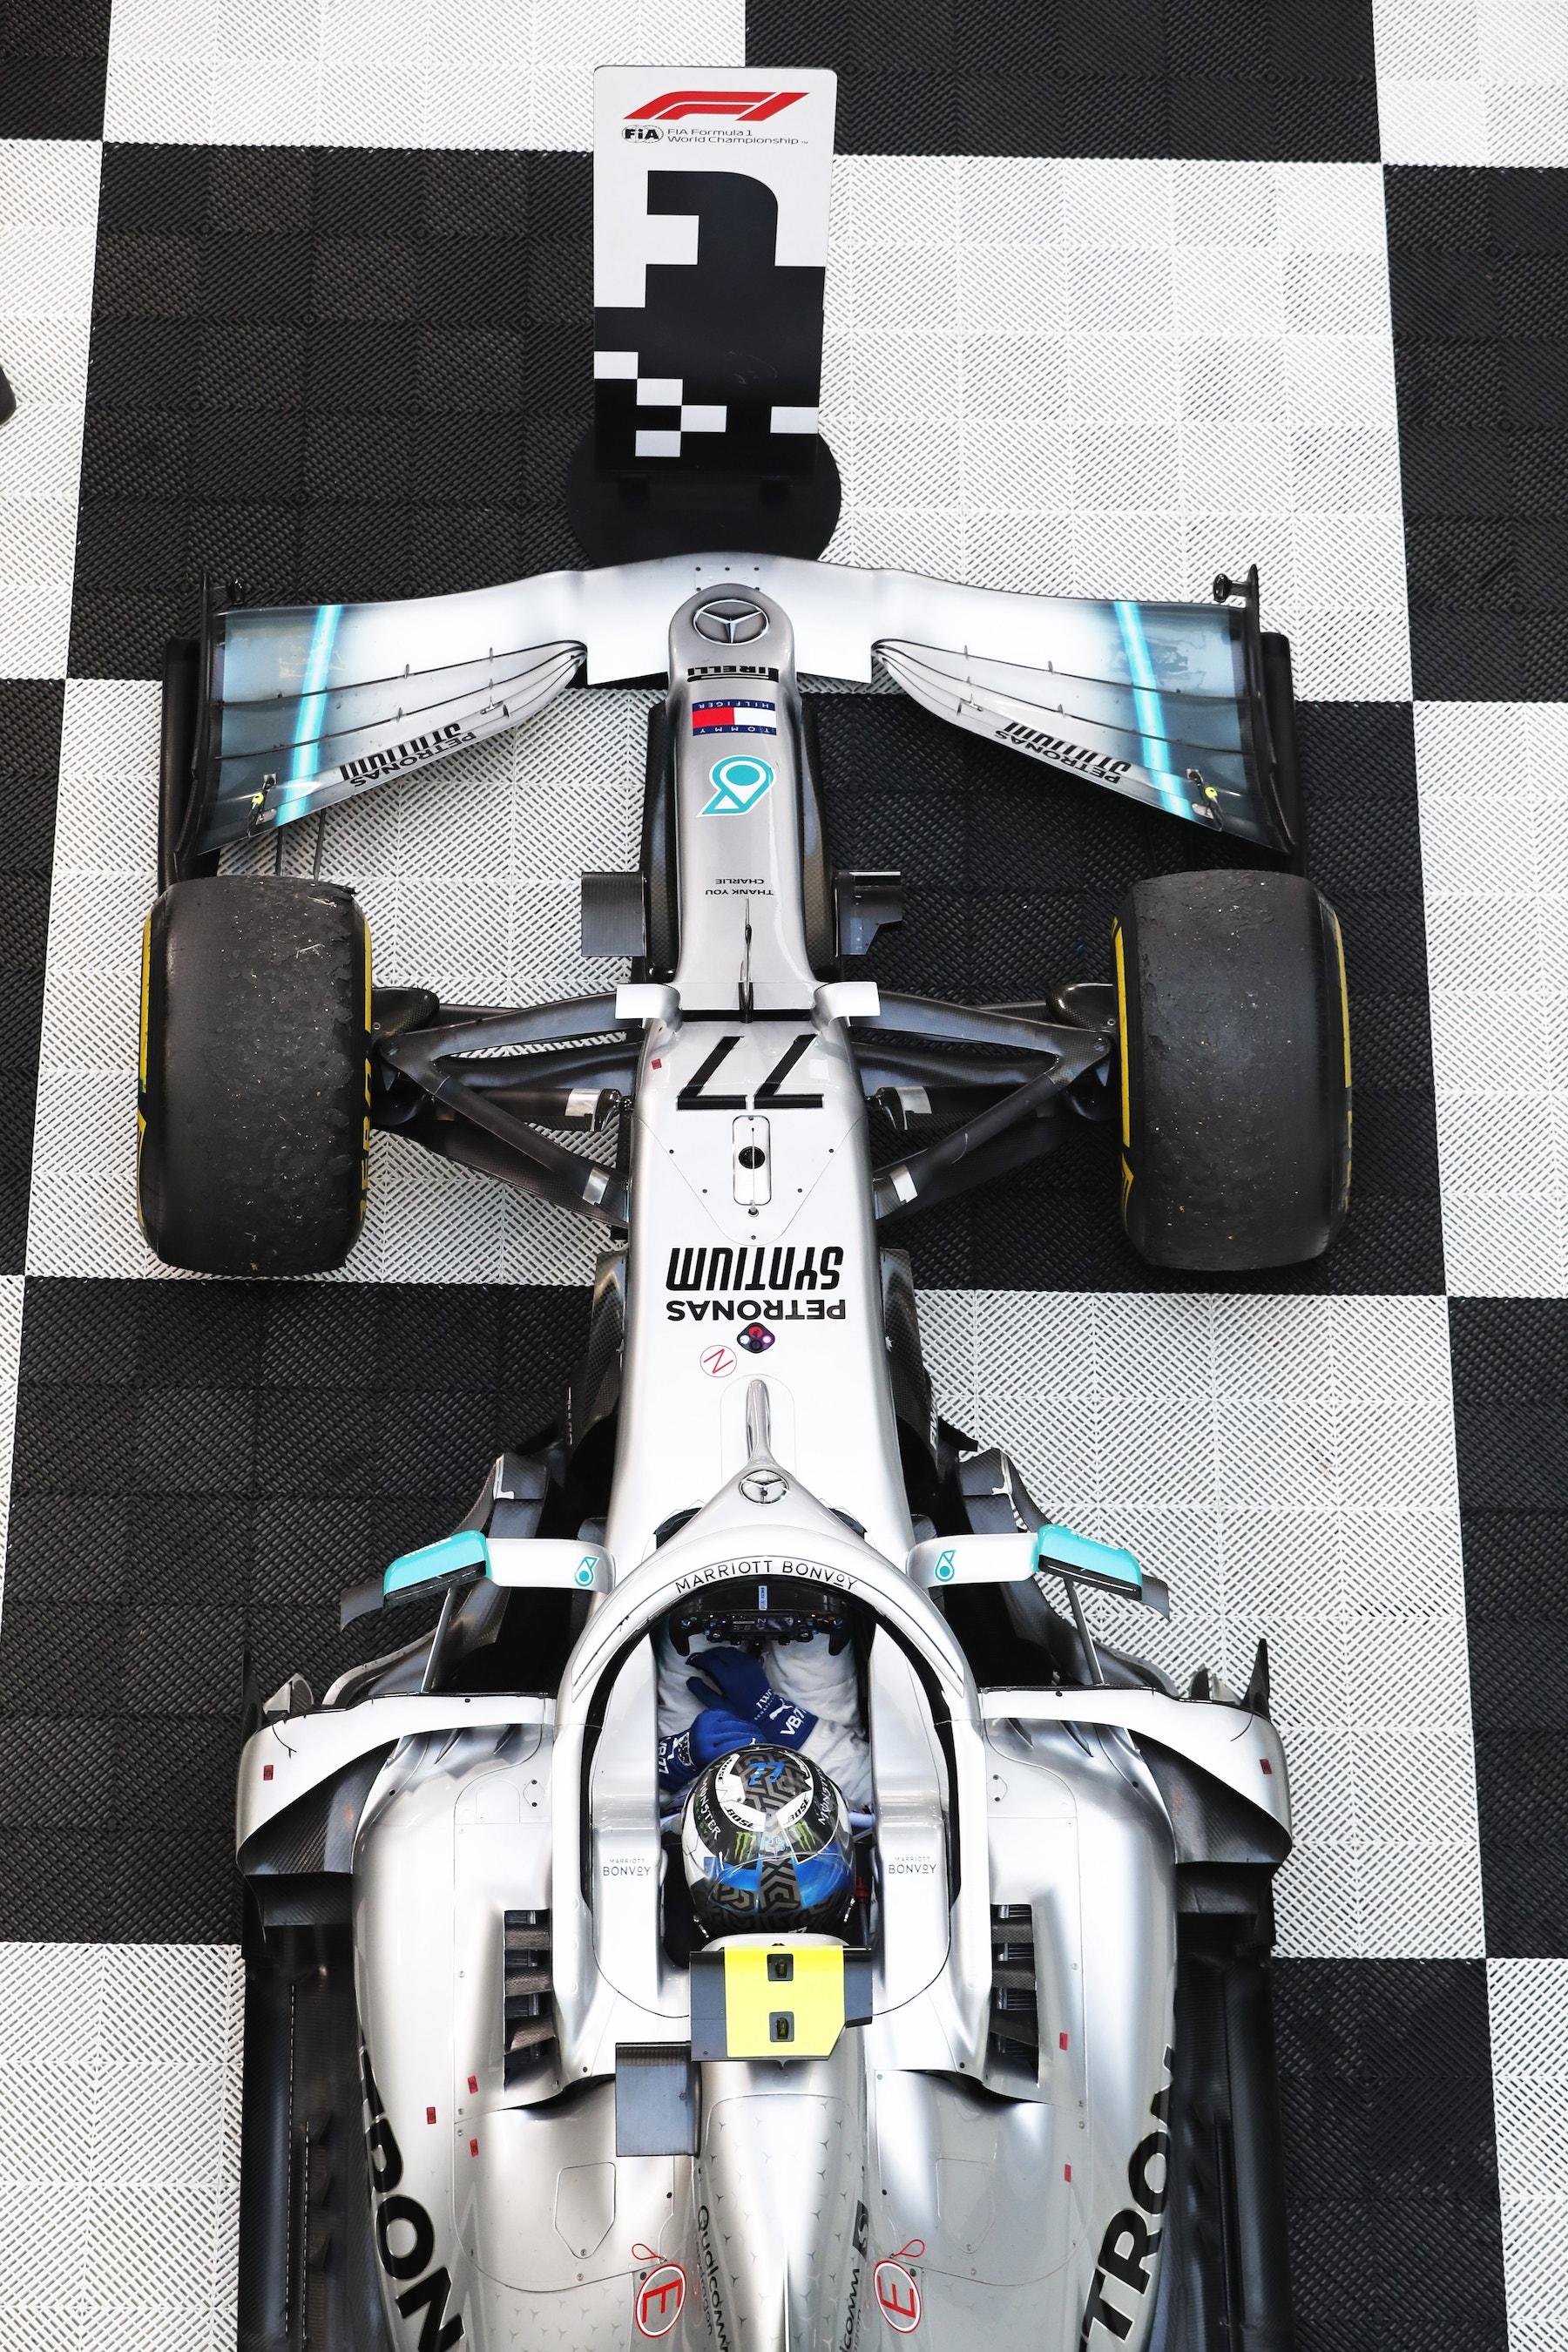 U 2019 Valtteri Bottas | Mercedes W10 | 2019 Australian GP winner 6 copy.jpg